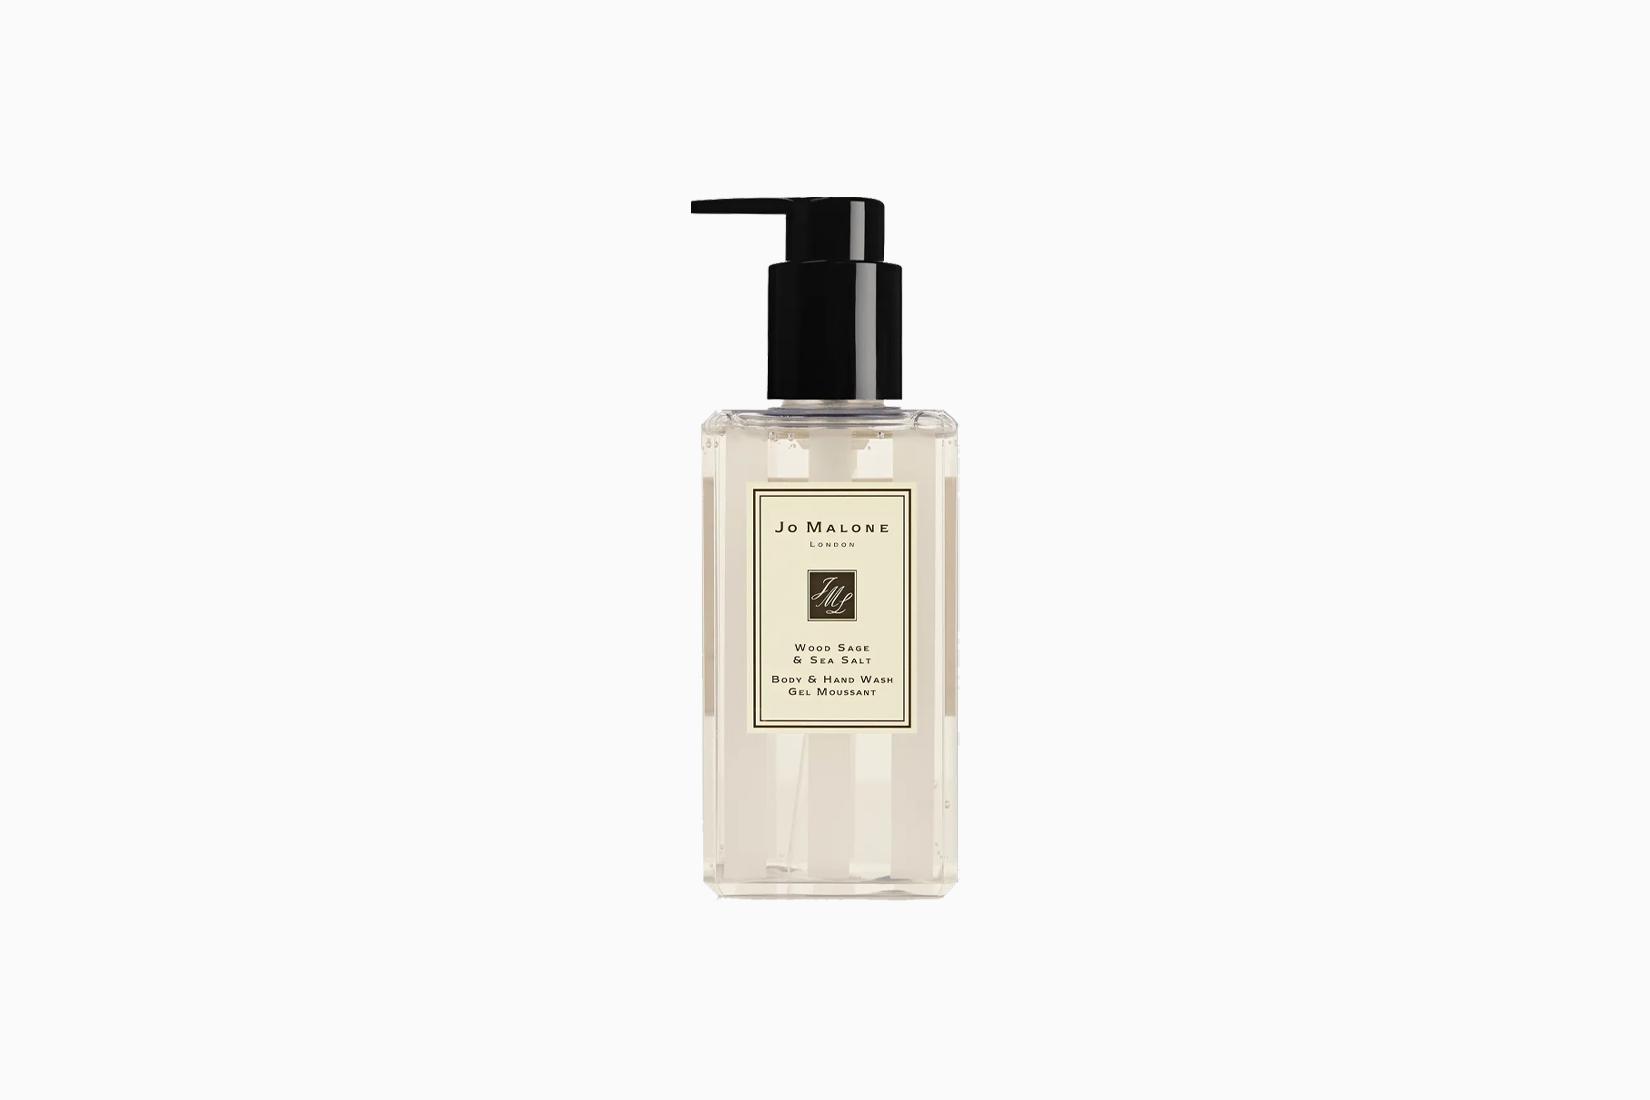 best hand soap jo malone review - Luxe Digital